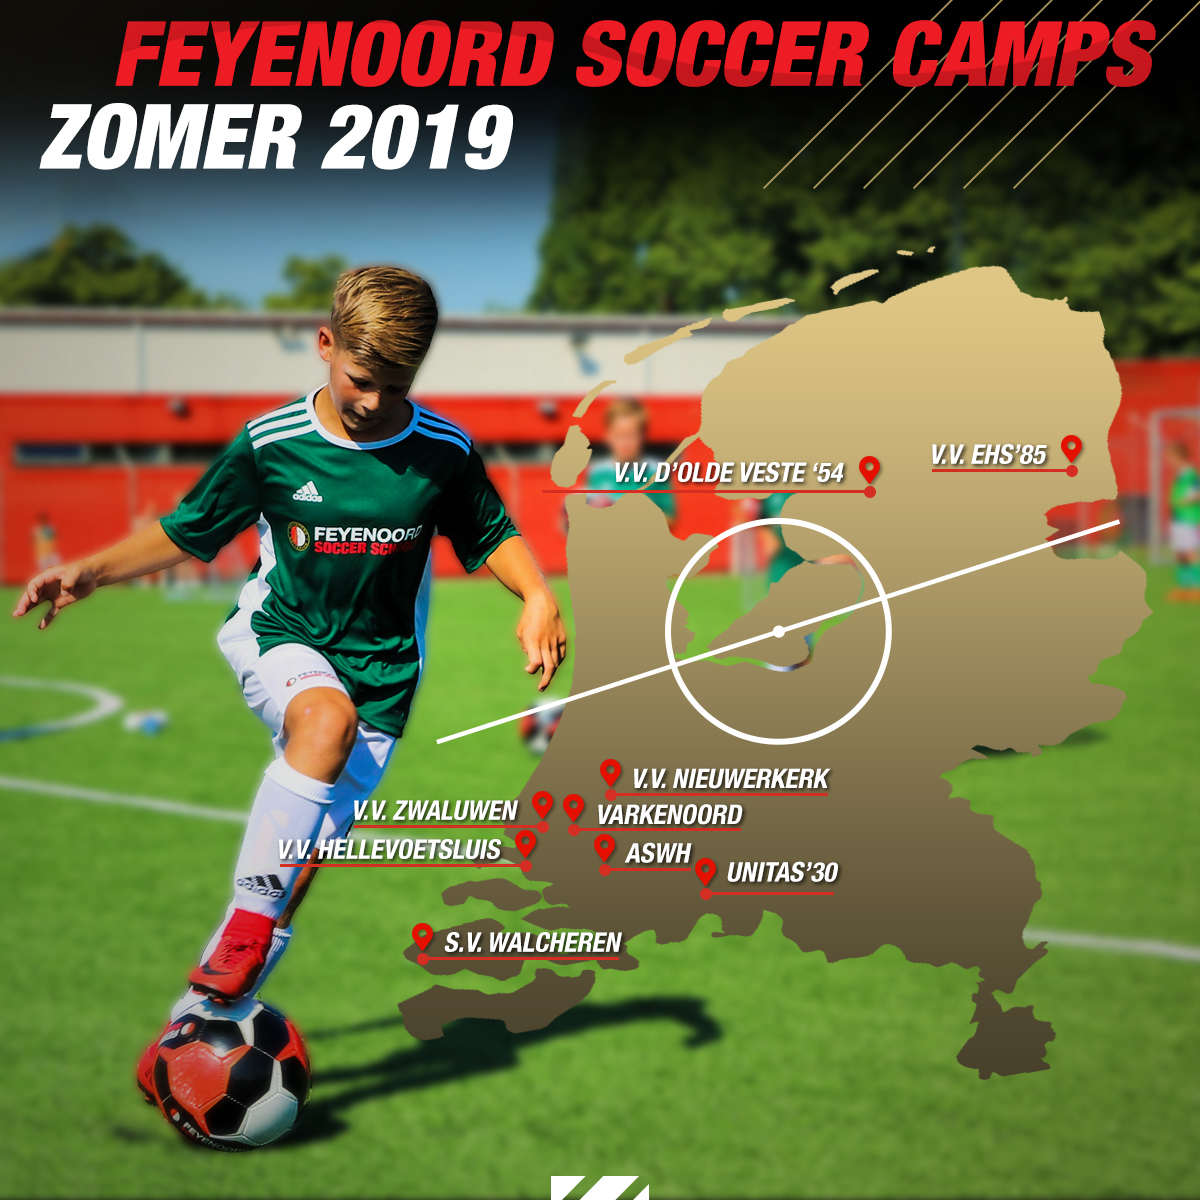 Feyenoord Soccer Camps Zomer 2019